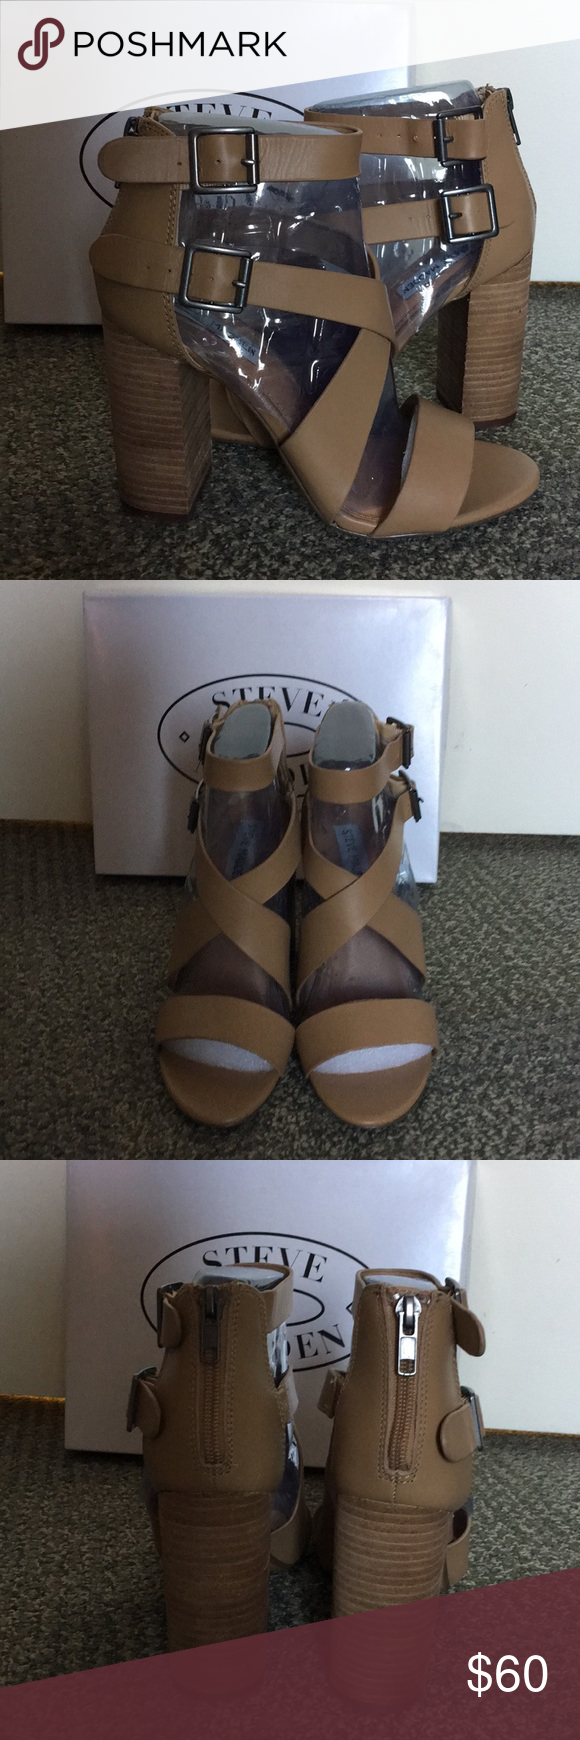 c543a9a836b Steve Madden Sundance Natural Leather sandal Unworn block heeled sandal.  Dress up or down. New in box. Steve Madden Shoes Sandals